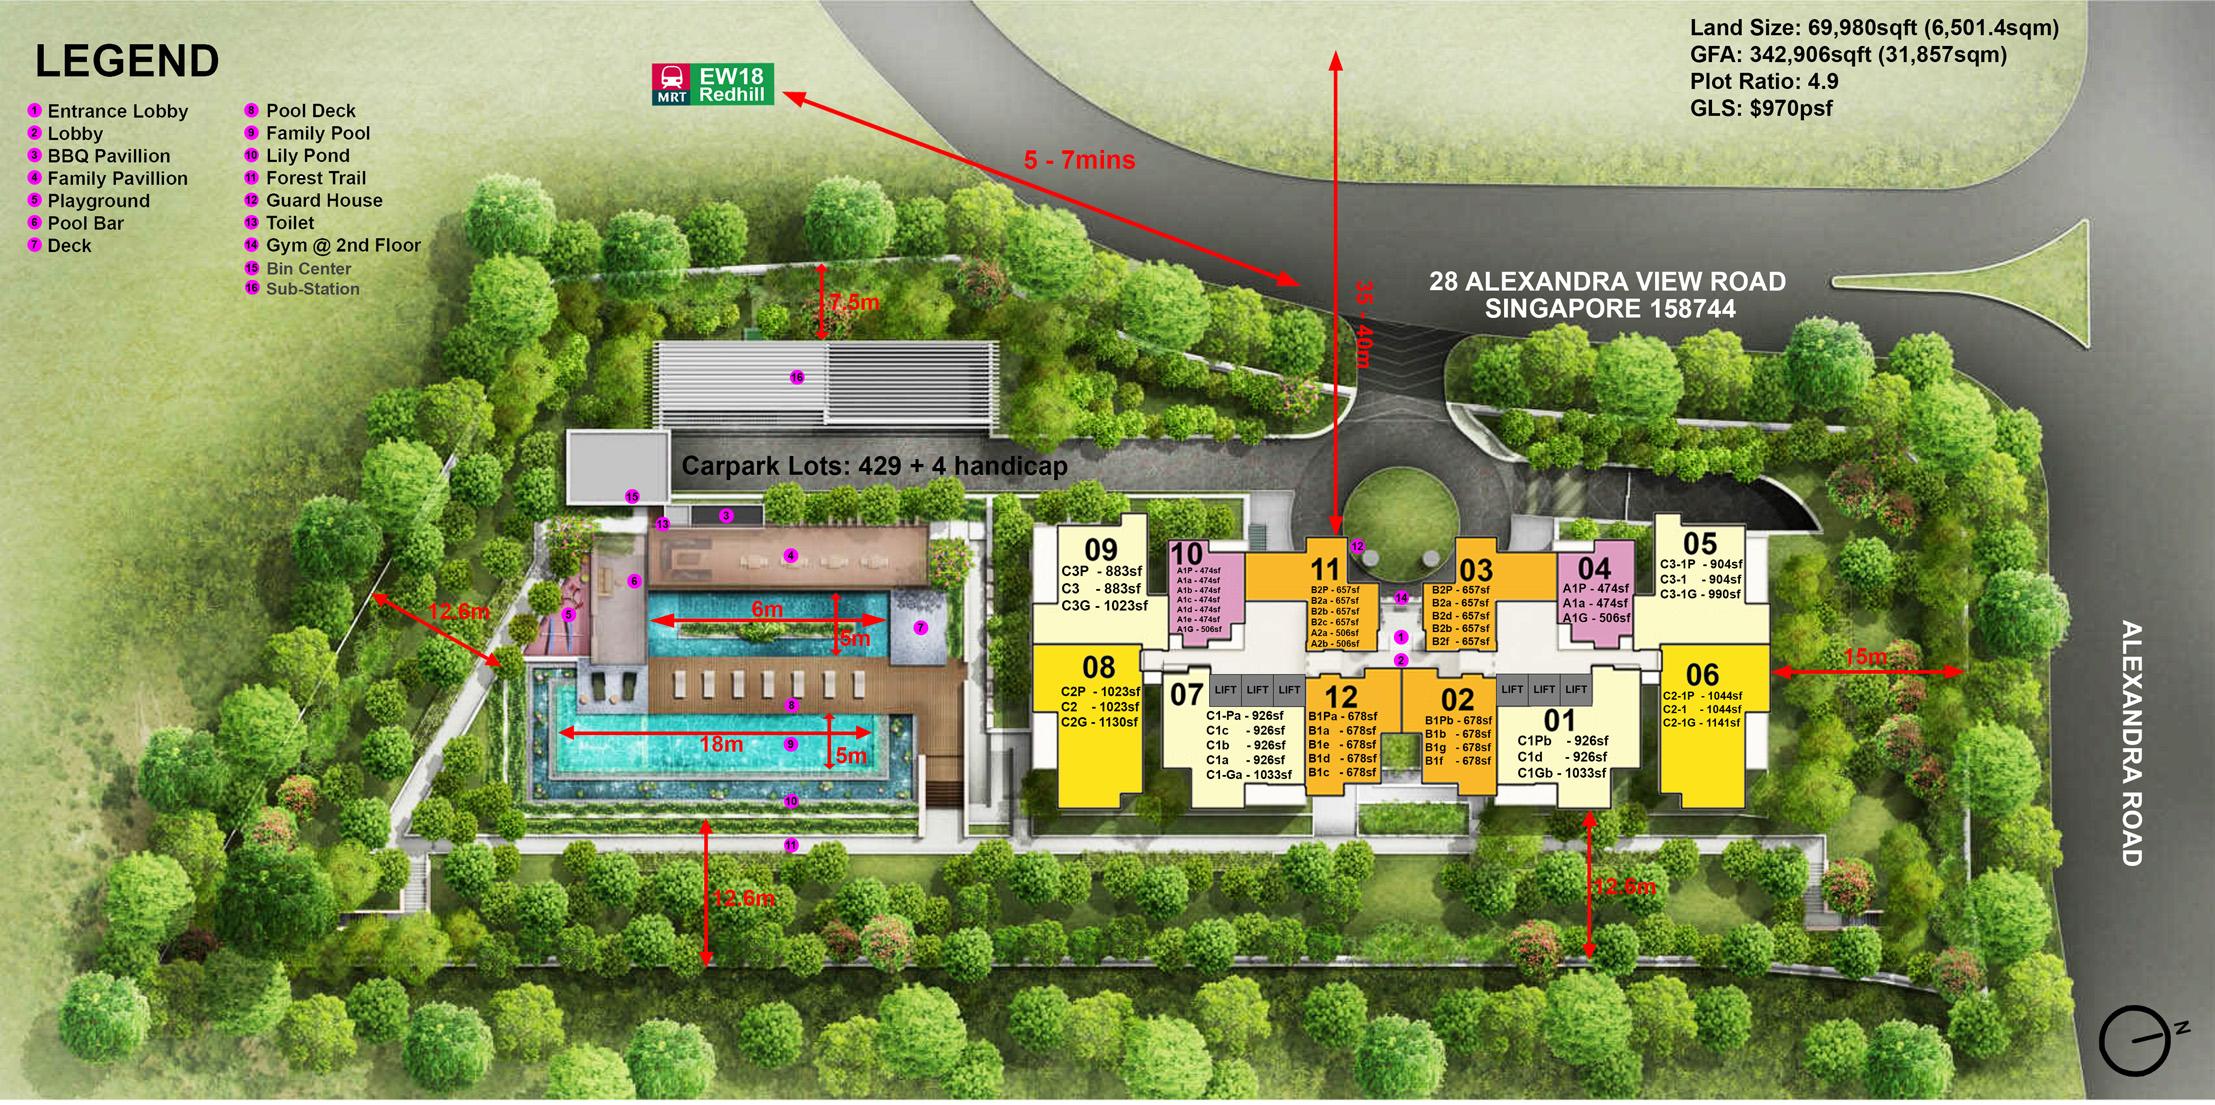 Alex-Residences-site-map alex residences Alex Residences | Showflat Hotline +65 6100 7122 Alex Residences site map